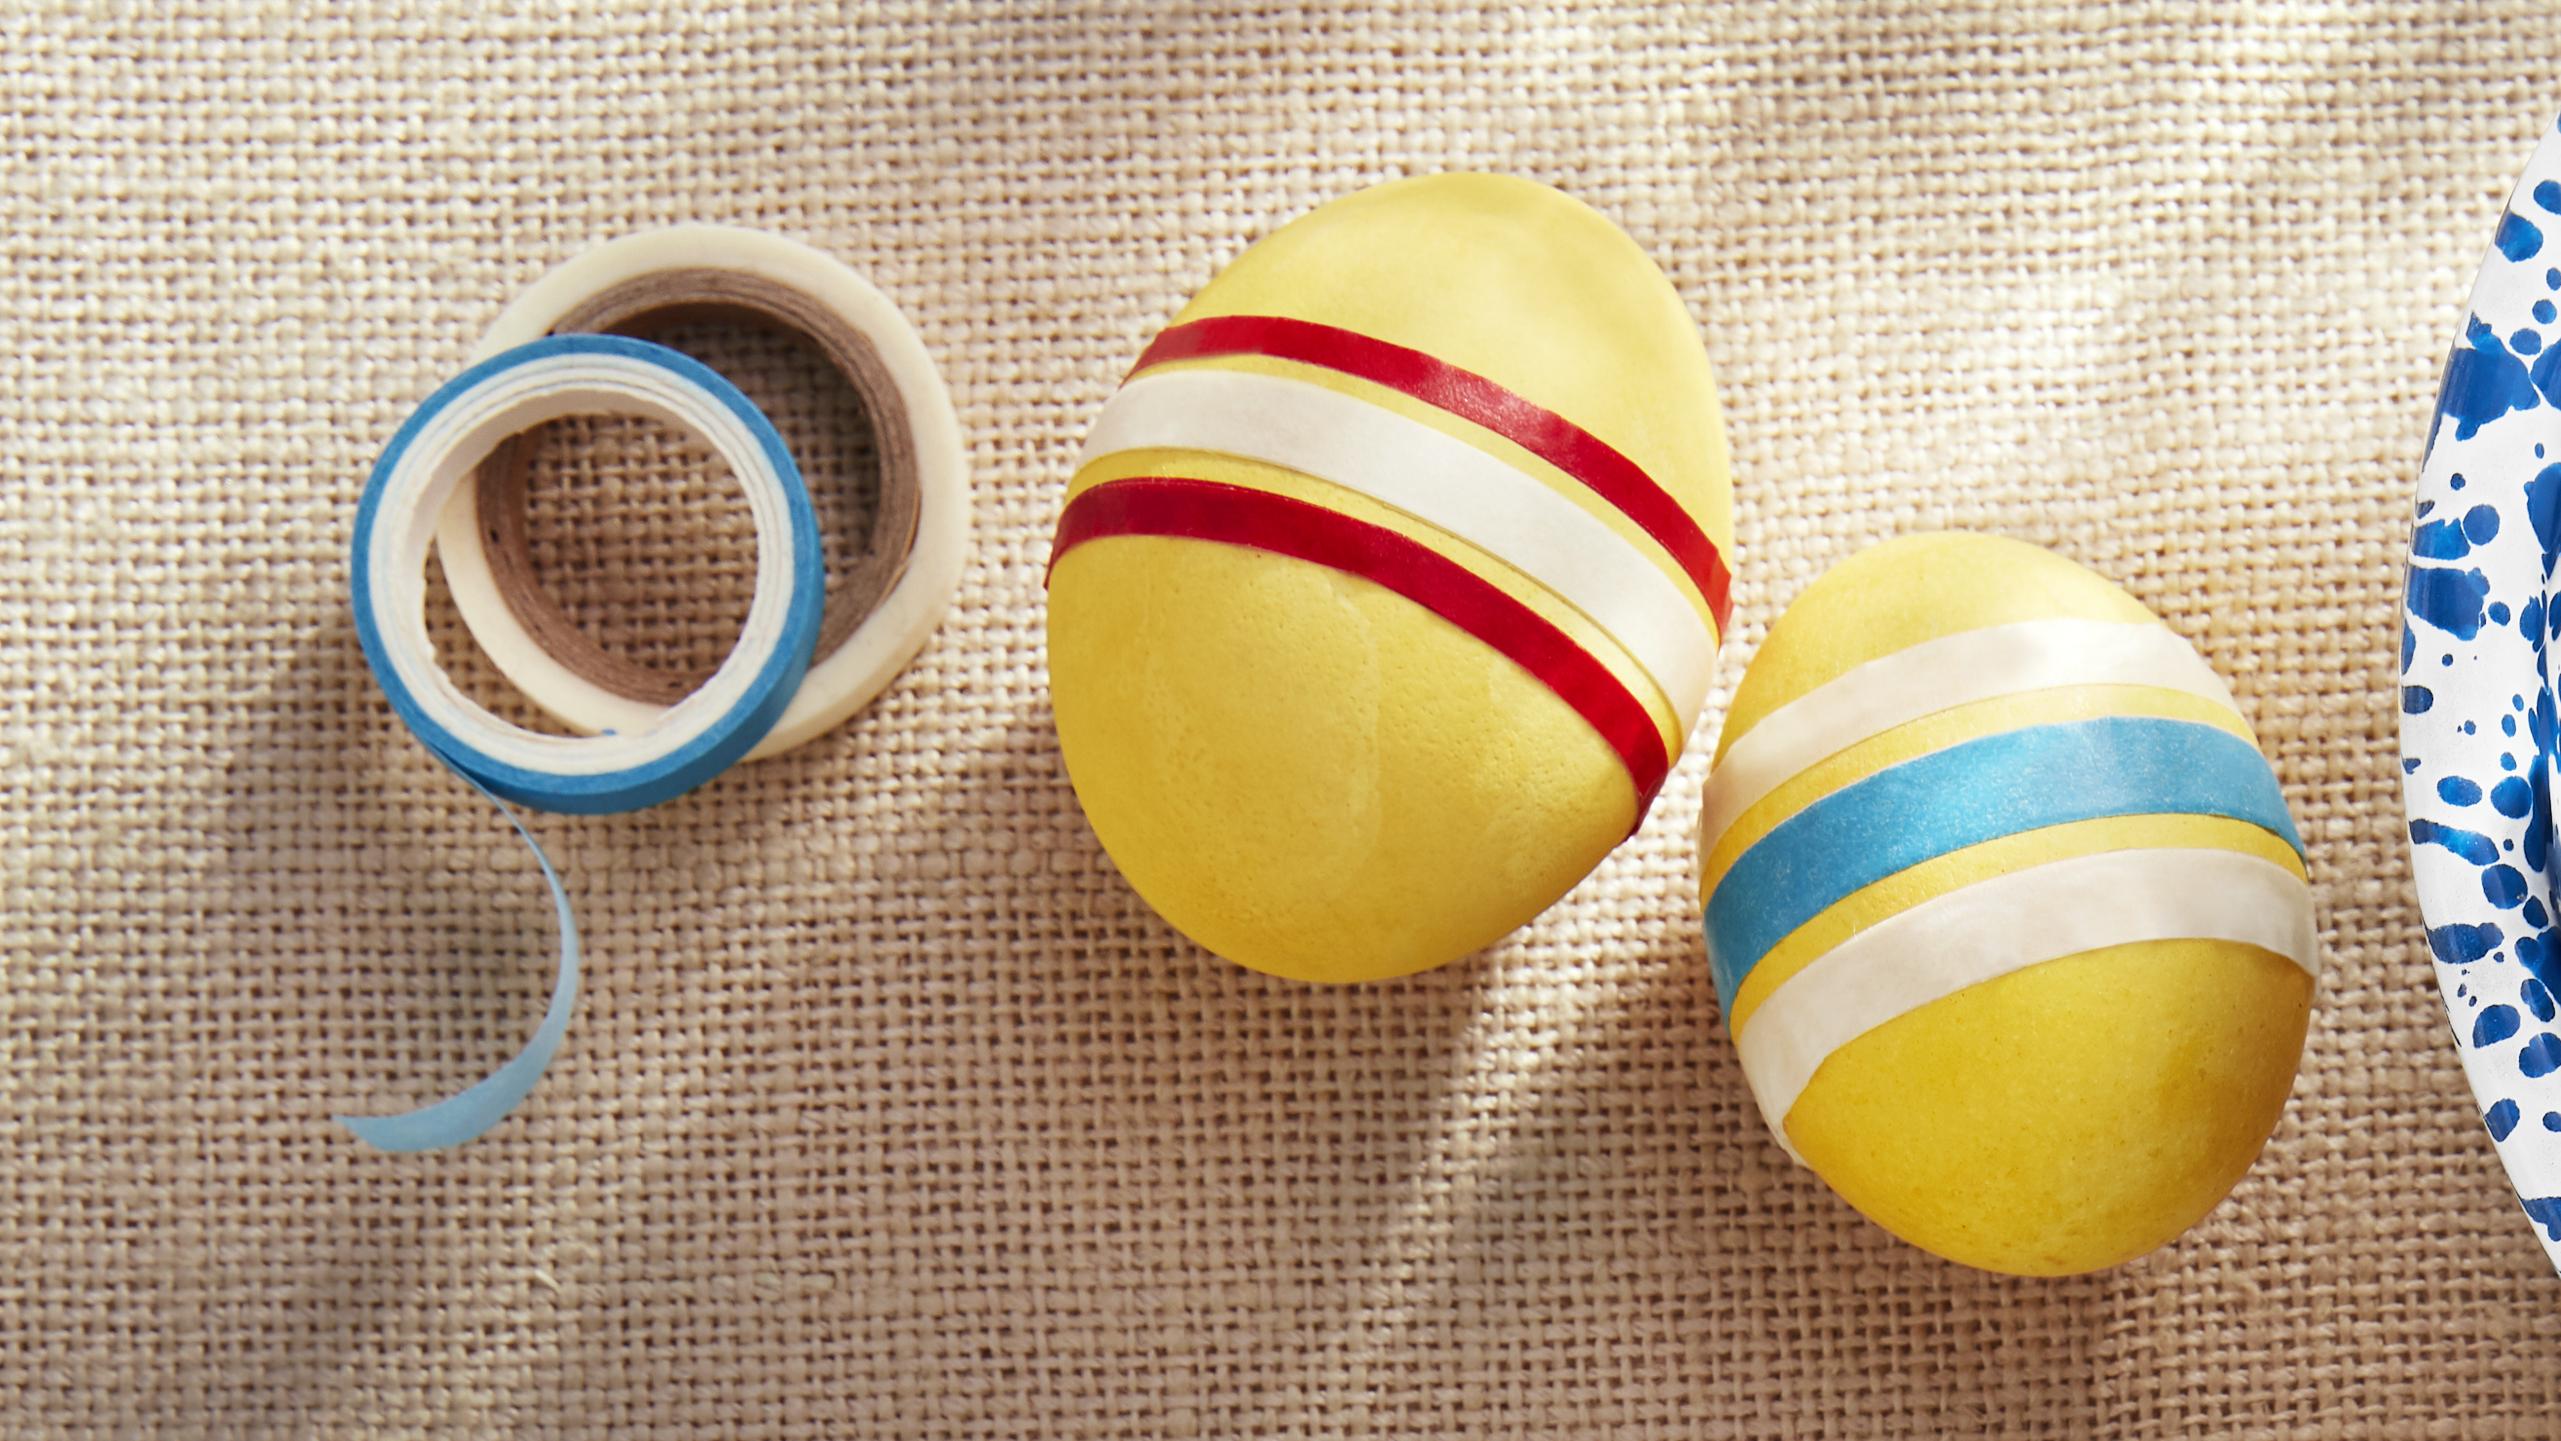 60+ Fun Easter Egg Designs - Creative Ideas for Easter Egg ...